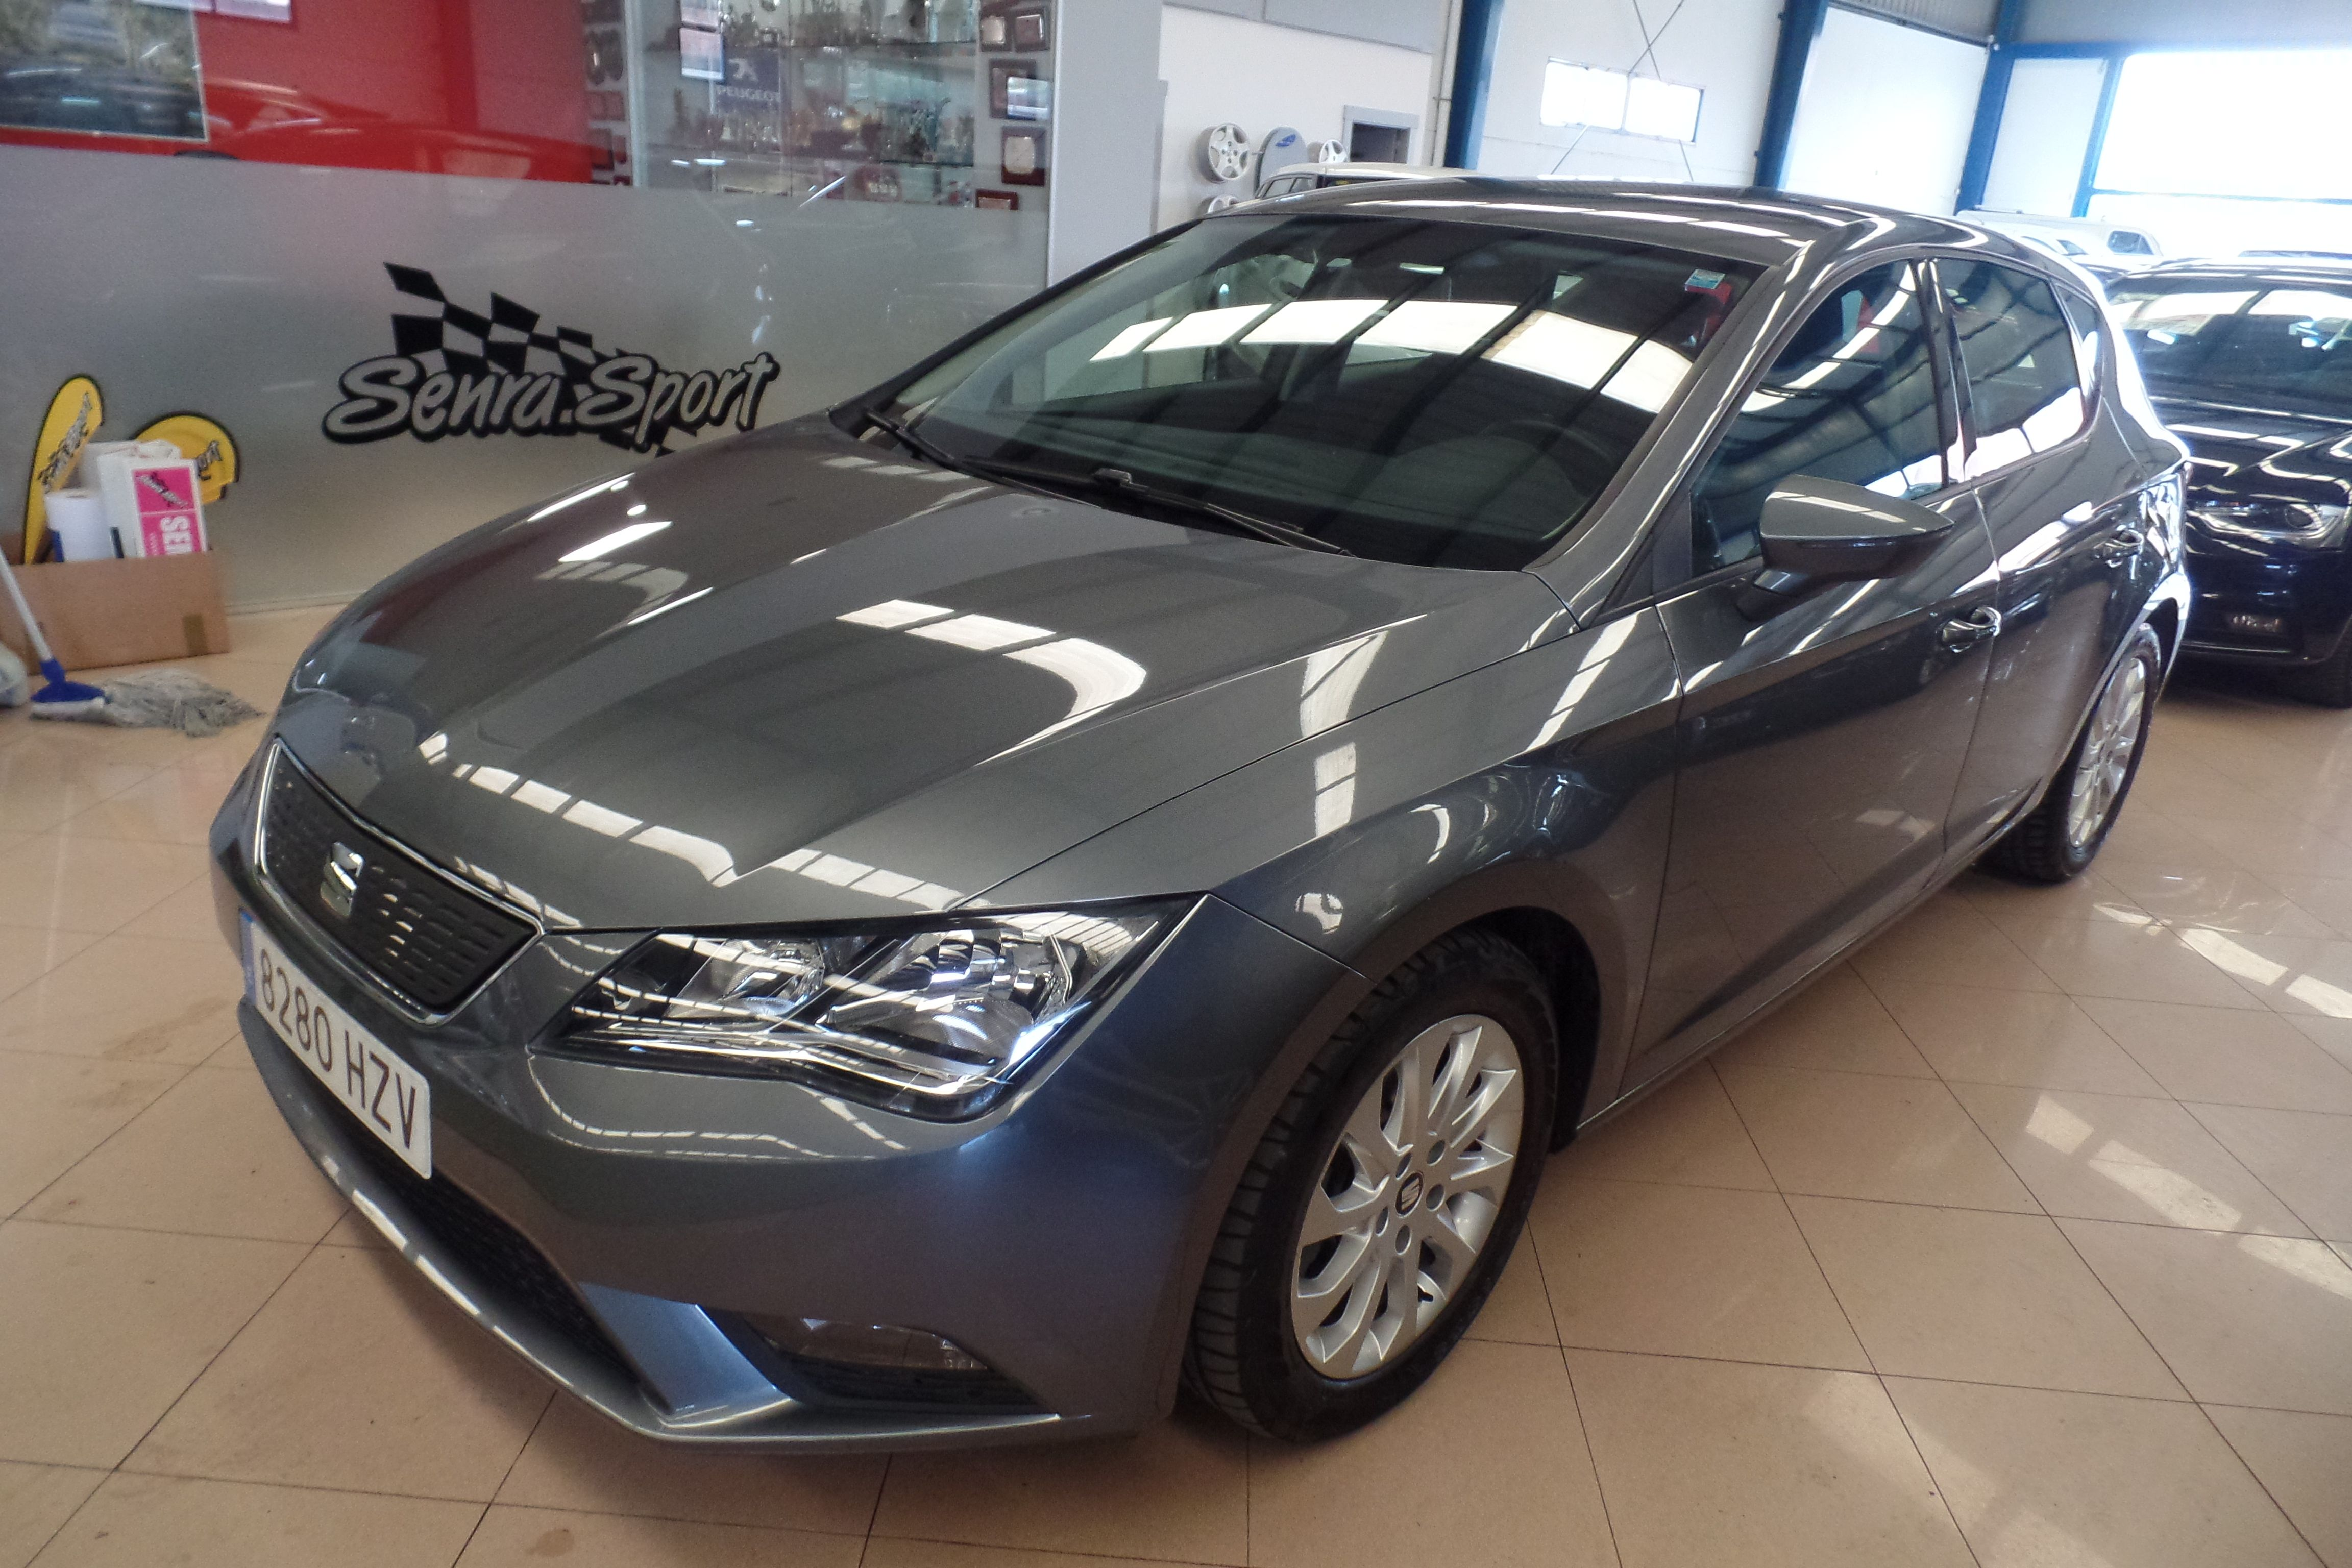 SEAT Leon 1.6 TDI 110cv StSp Style Ecomotive (8280-HZV): Servicios Peugeot de Senra Sport